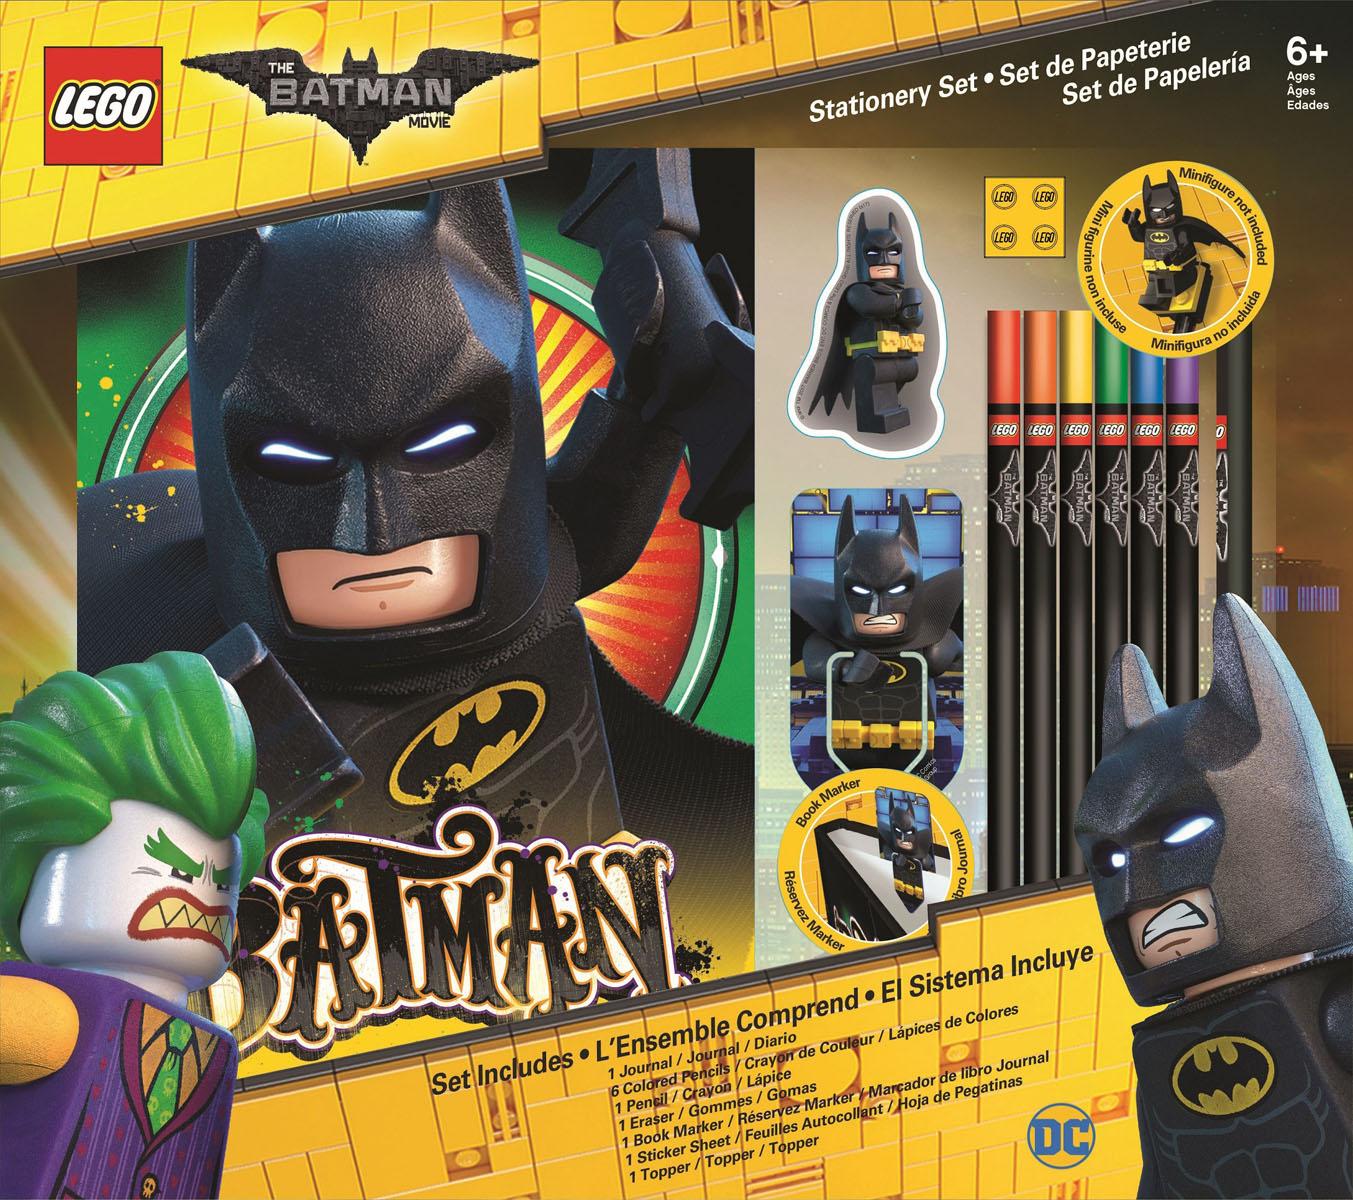 LEGO Набор канцелярских принадлежностей Batman Movie 12 предметов -  Канцелярские наборы